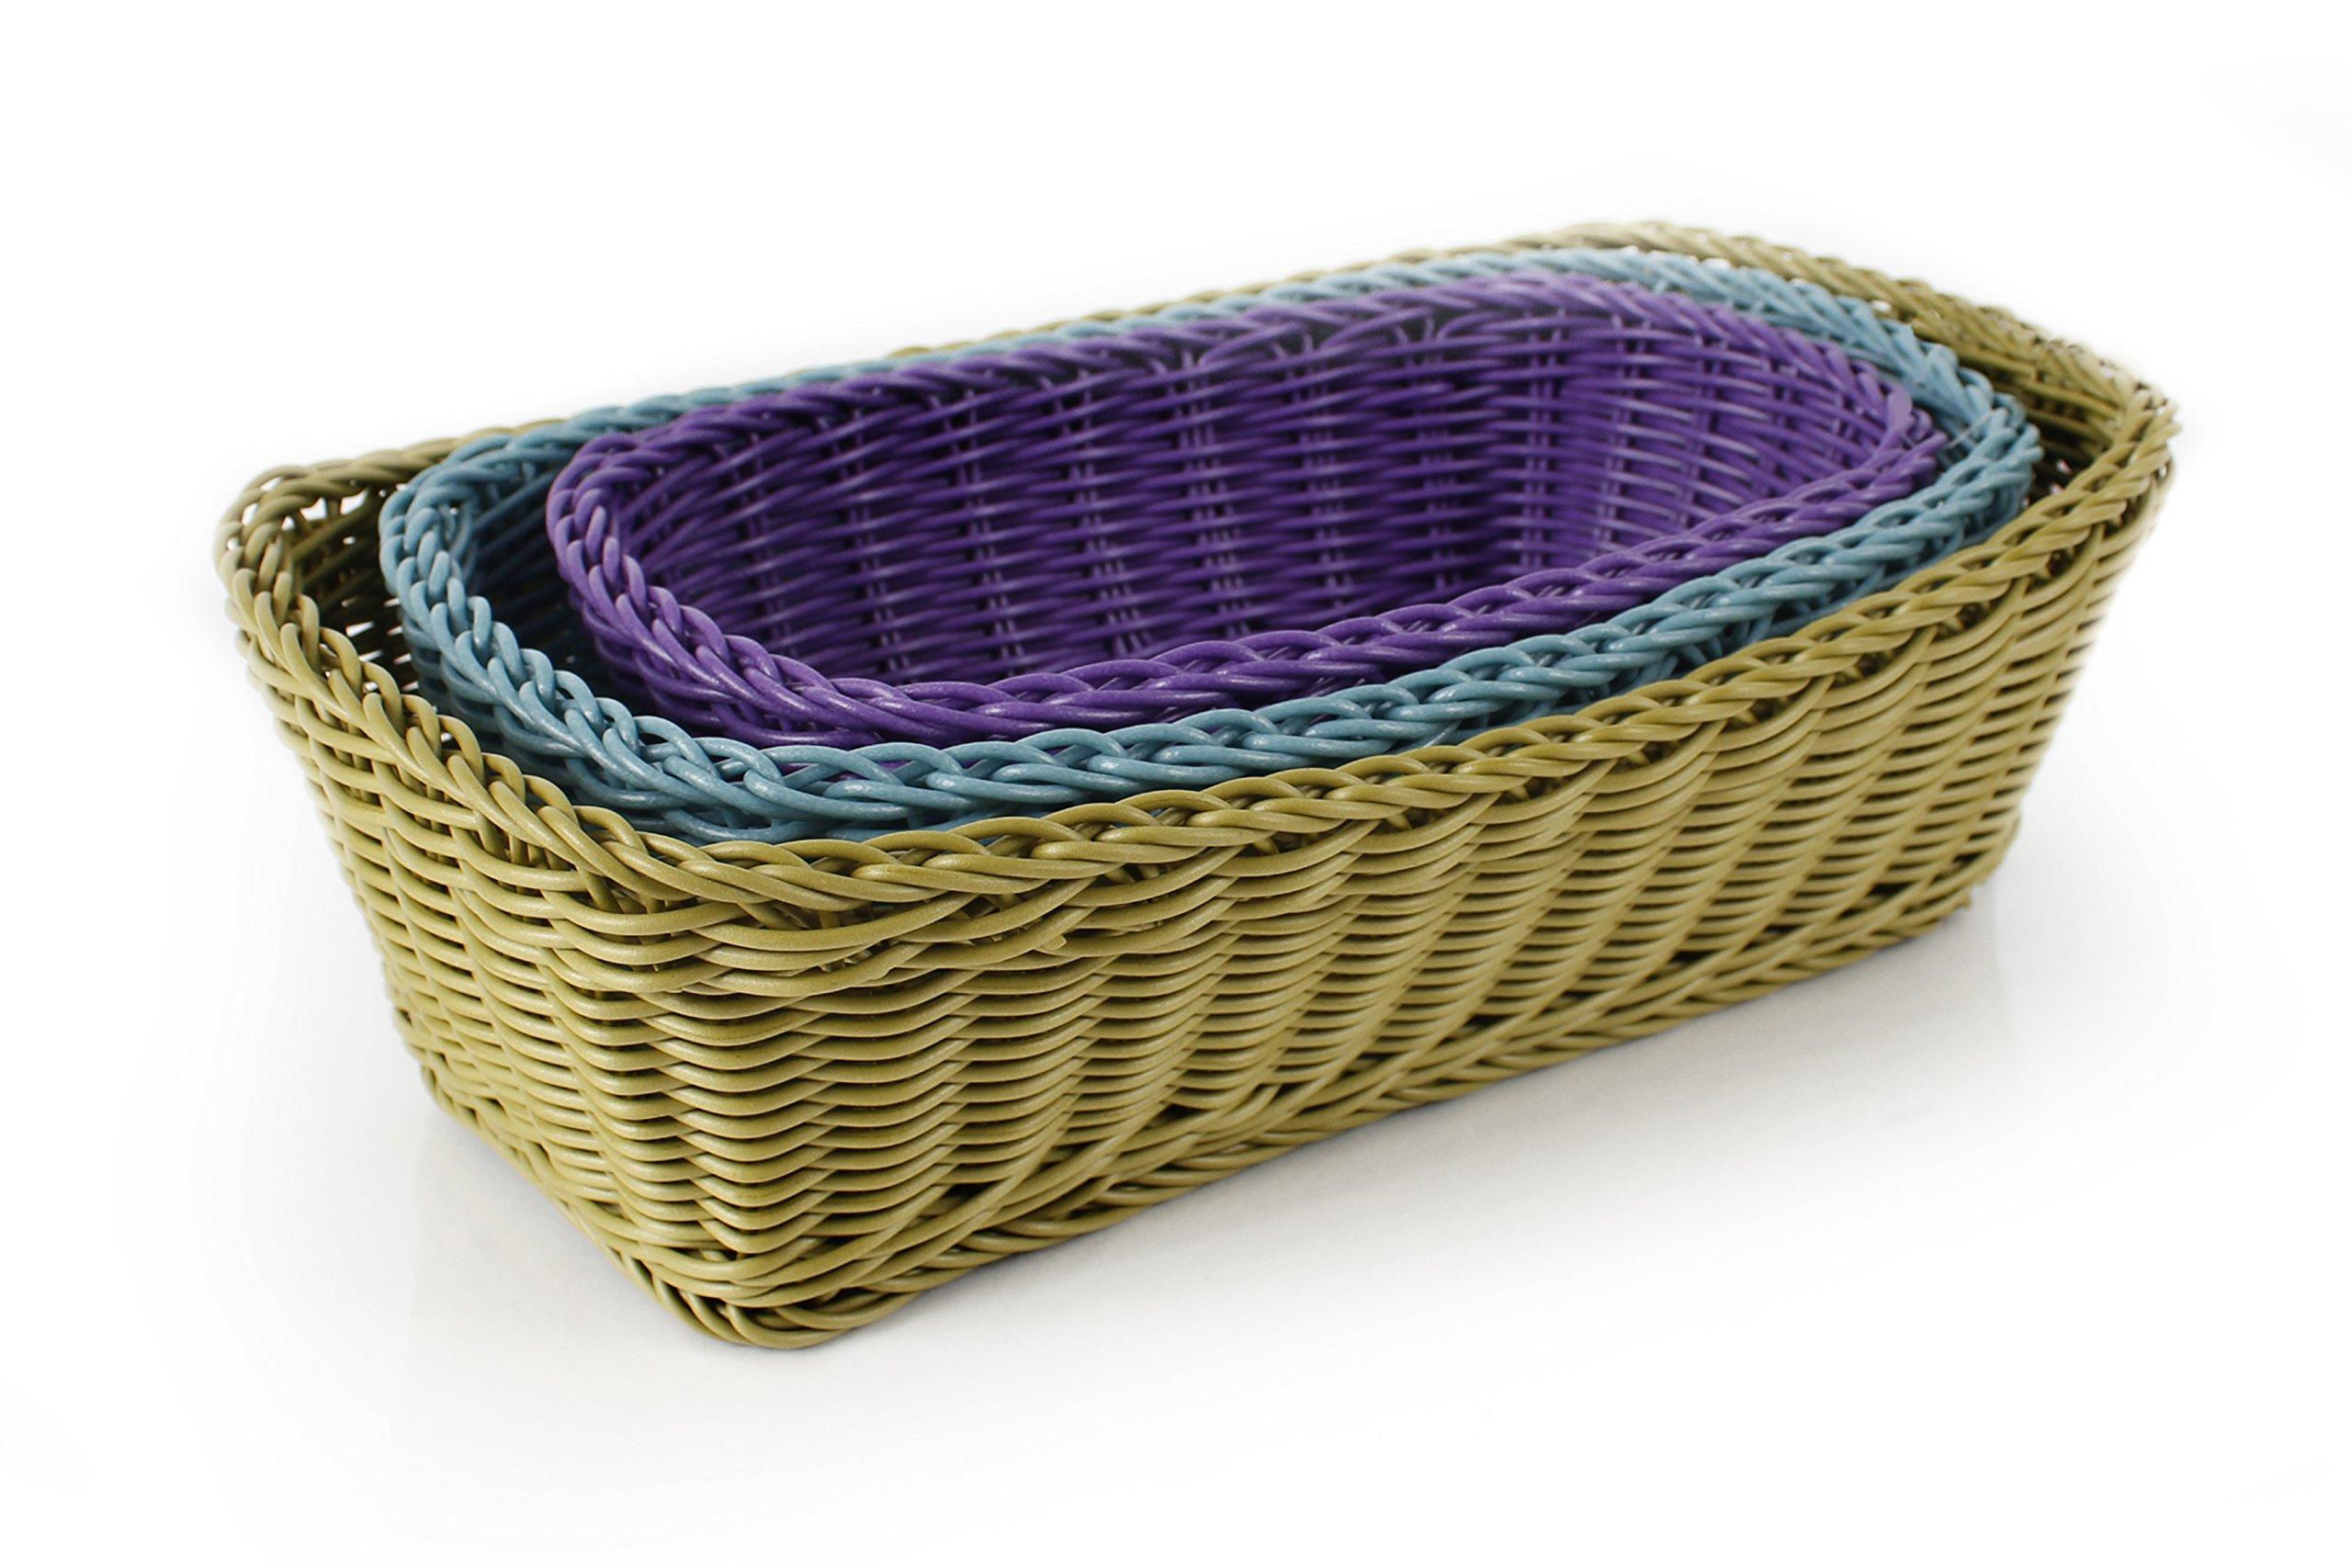 Neoflam 3-Piece Plasket Poly-Wicker Rectangle Baskets Set